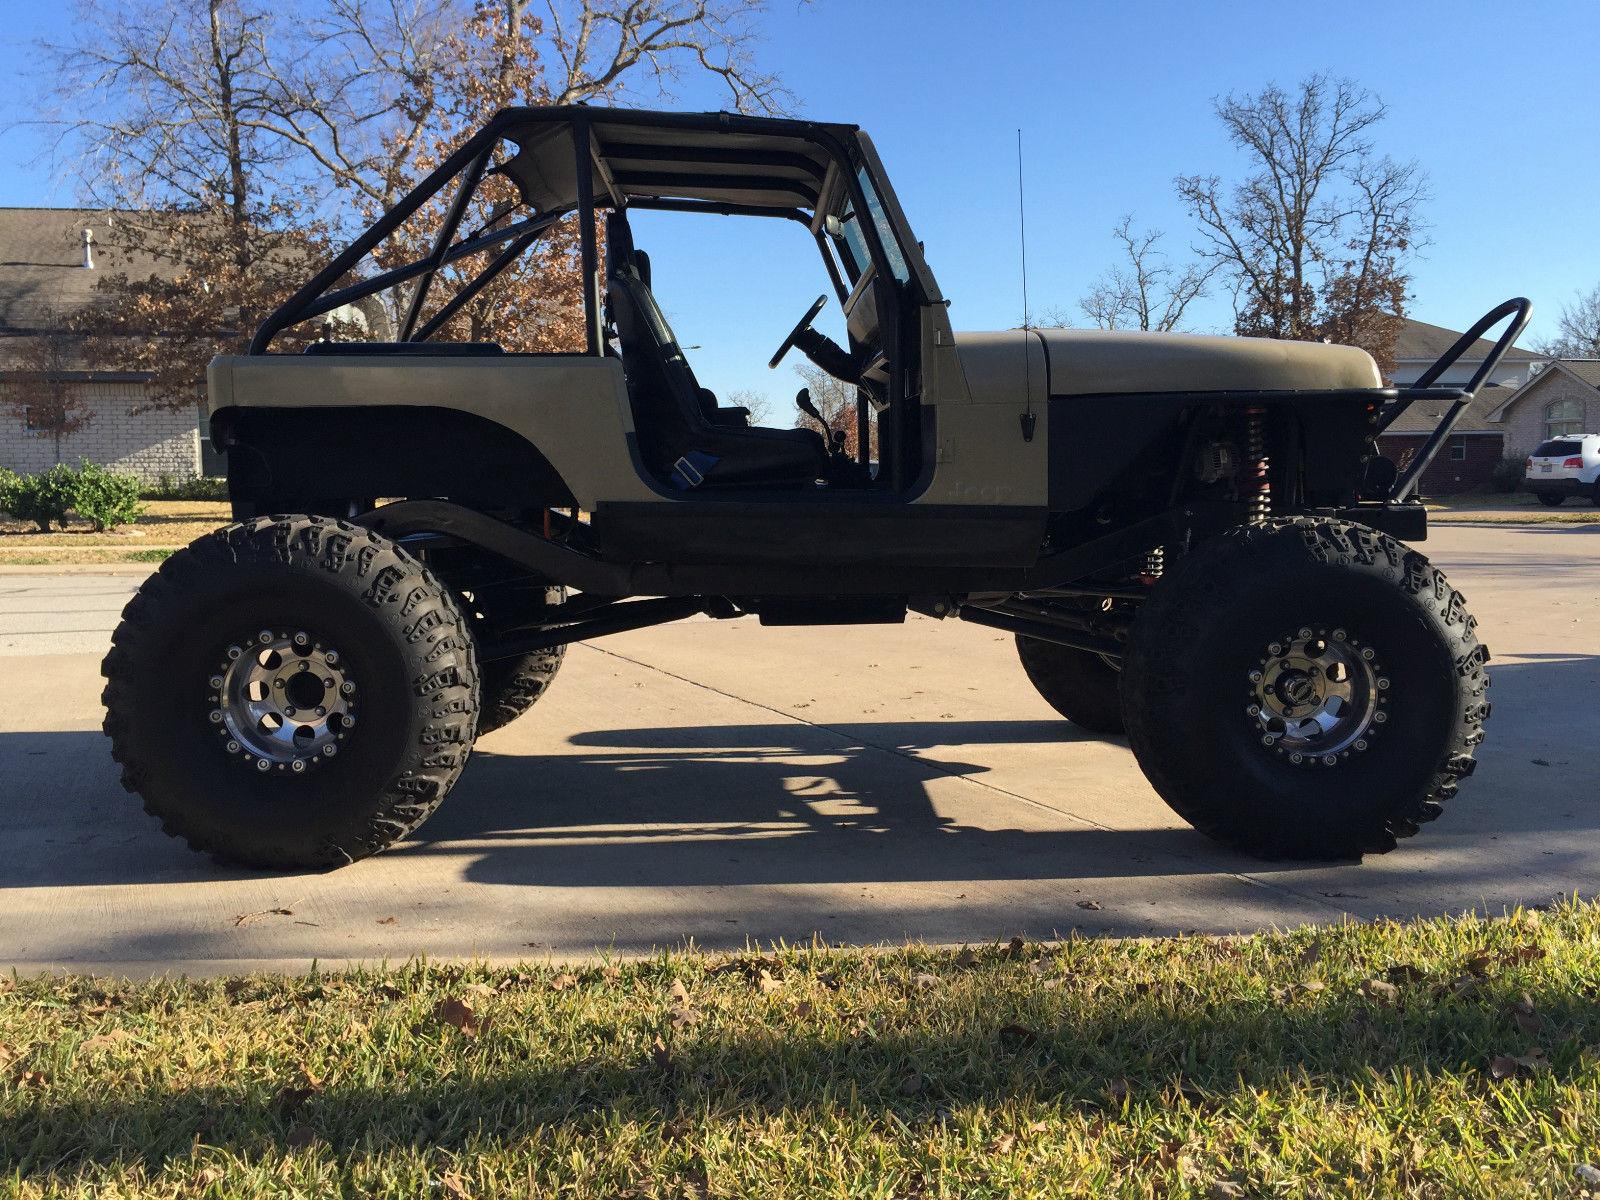 Jeep Rock Crawler 1992 Jeep Wrangler Yj Custom Rock Crawler Street Legal Classic